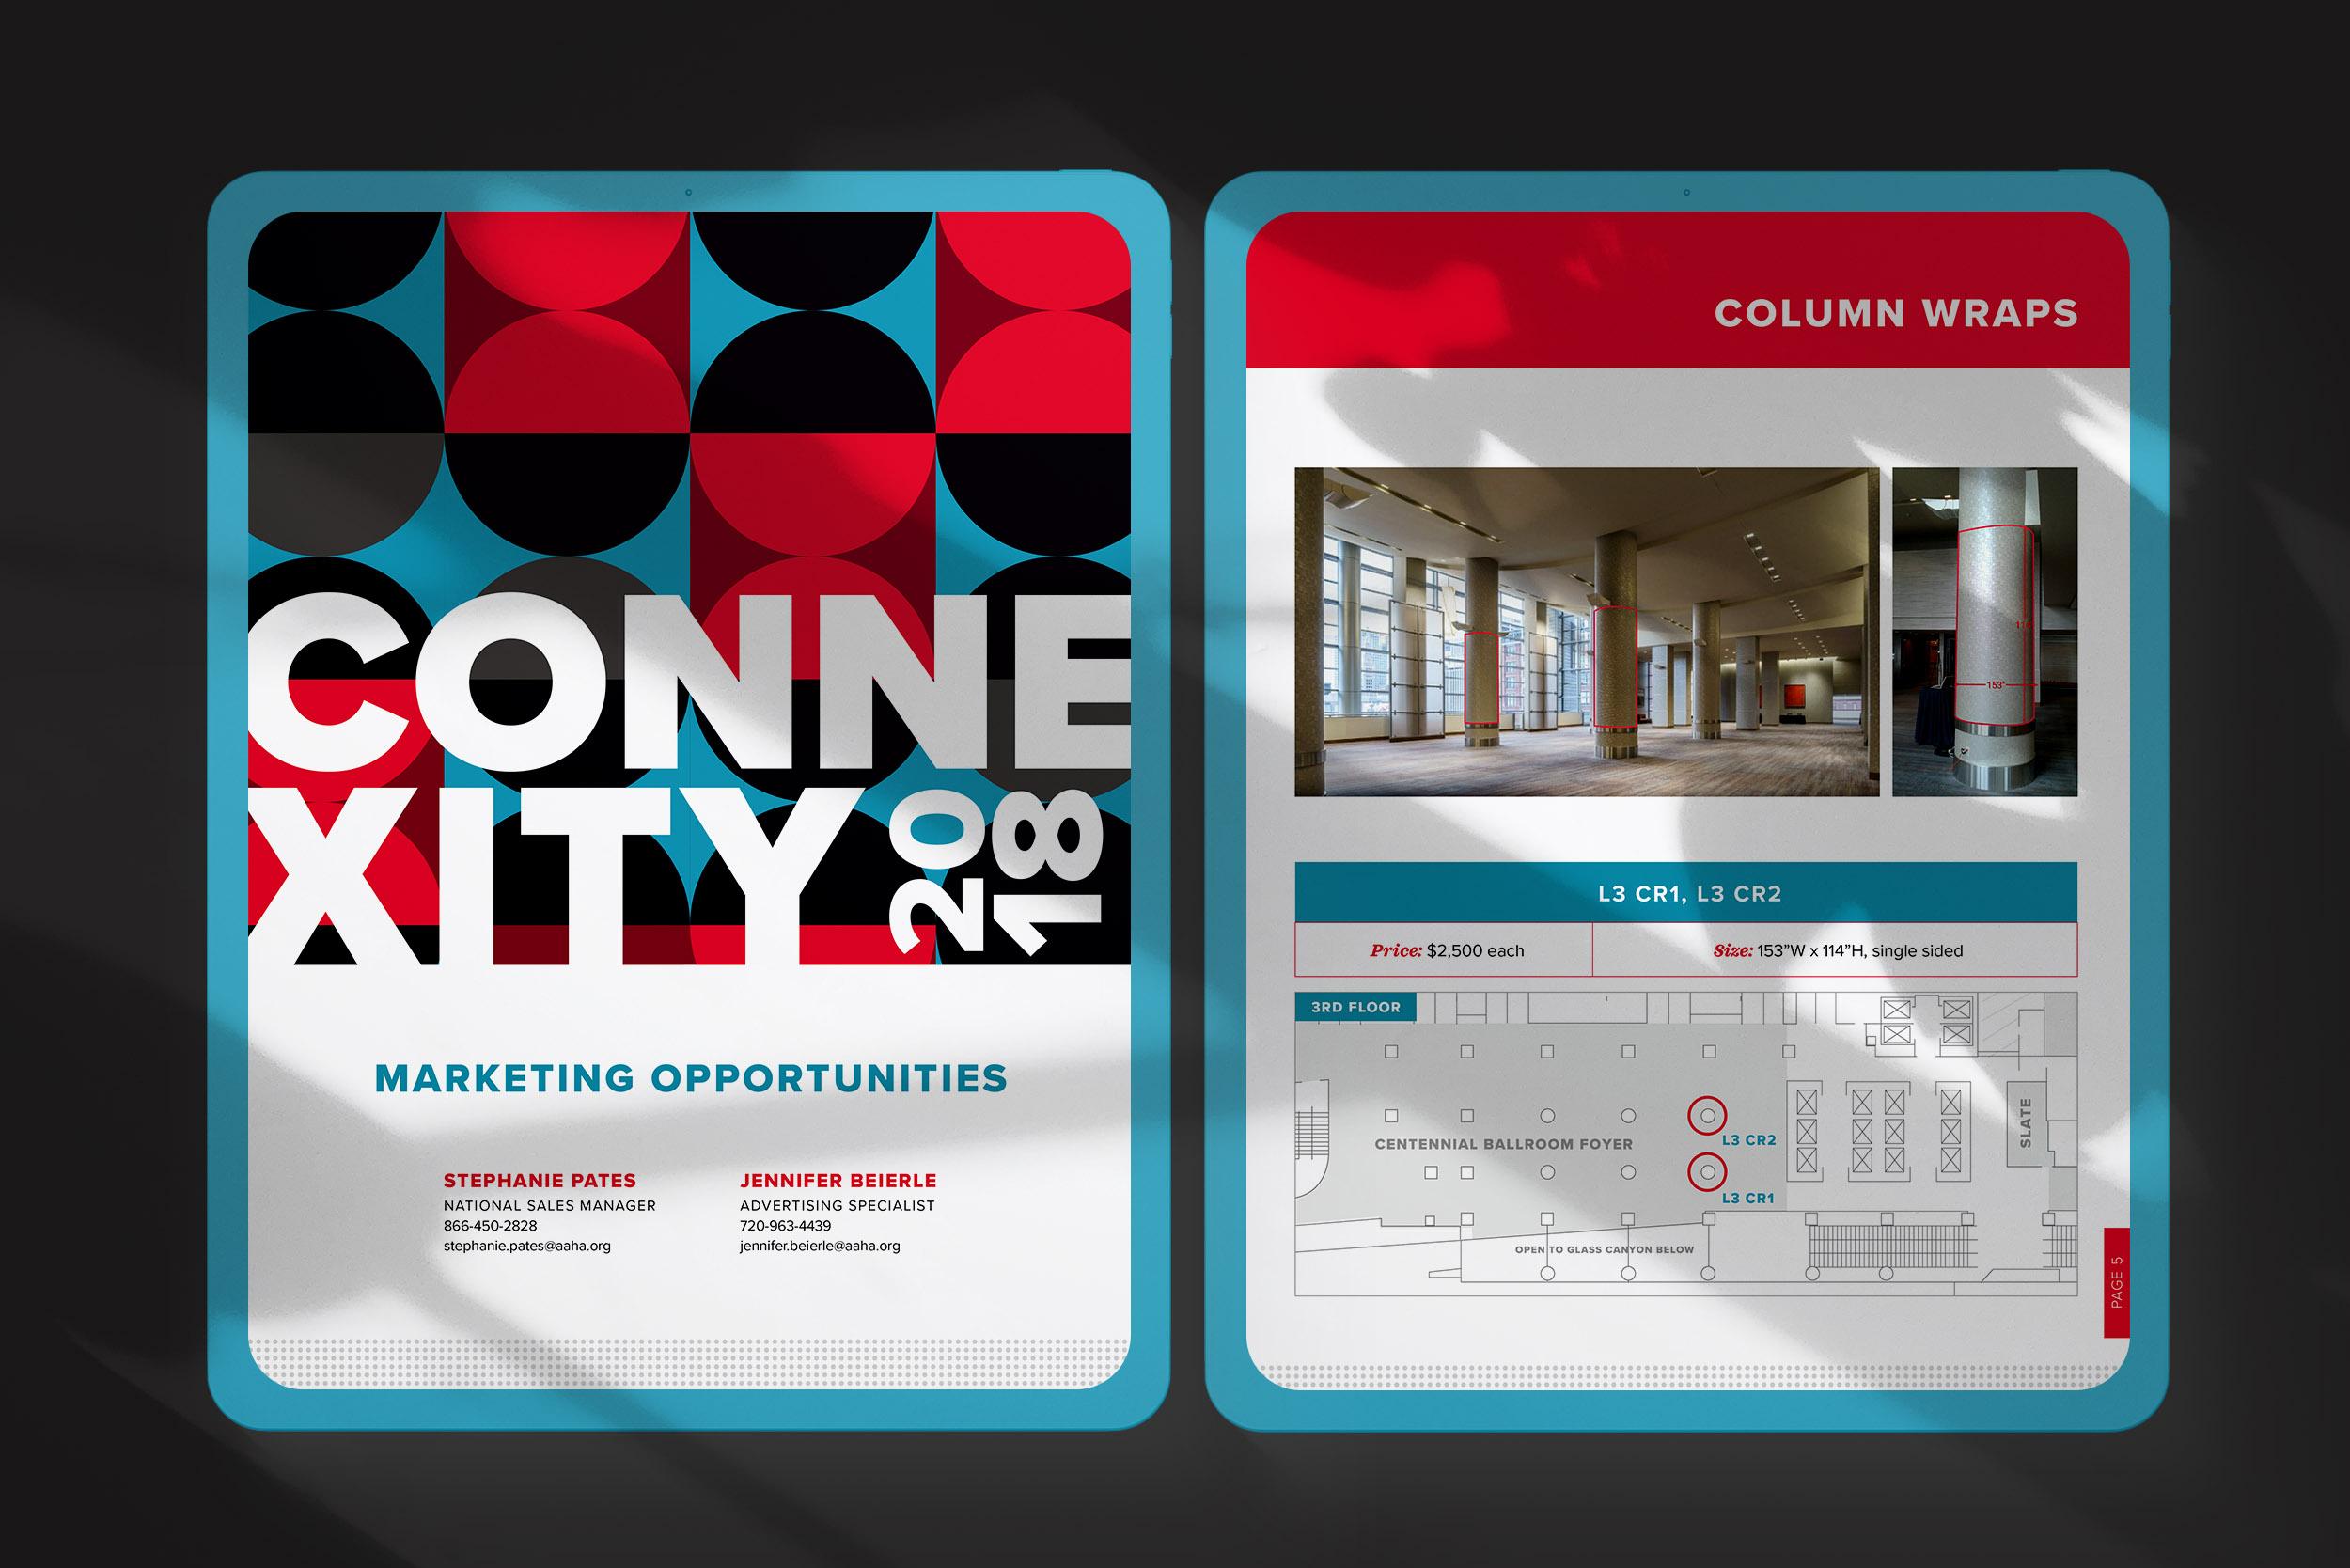 Connexity-5.jpg